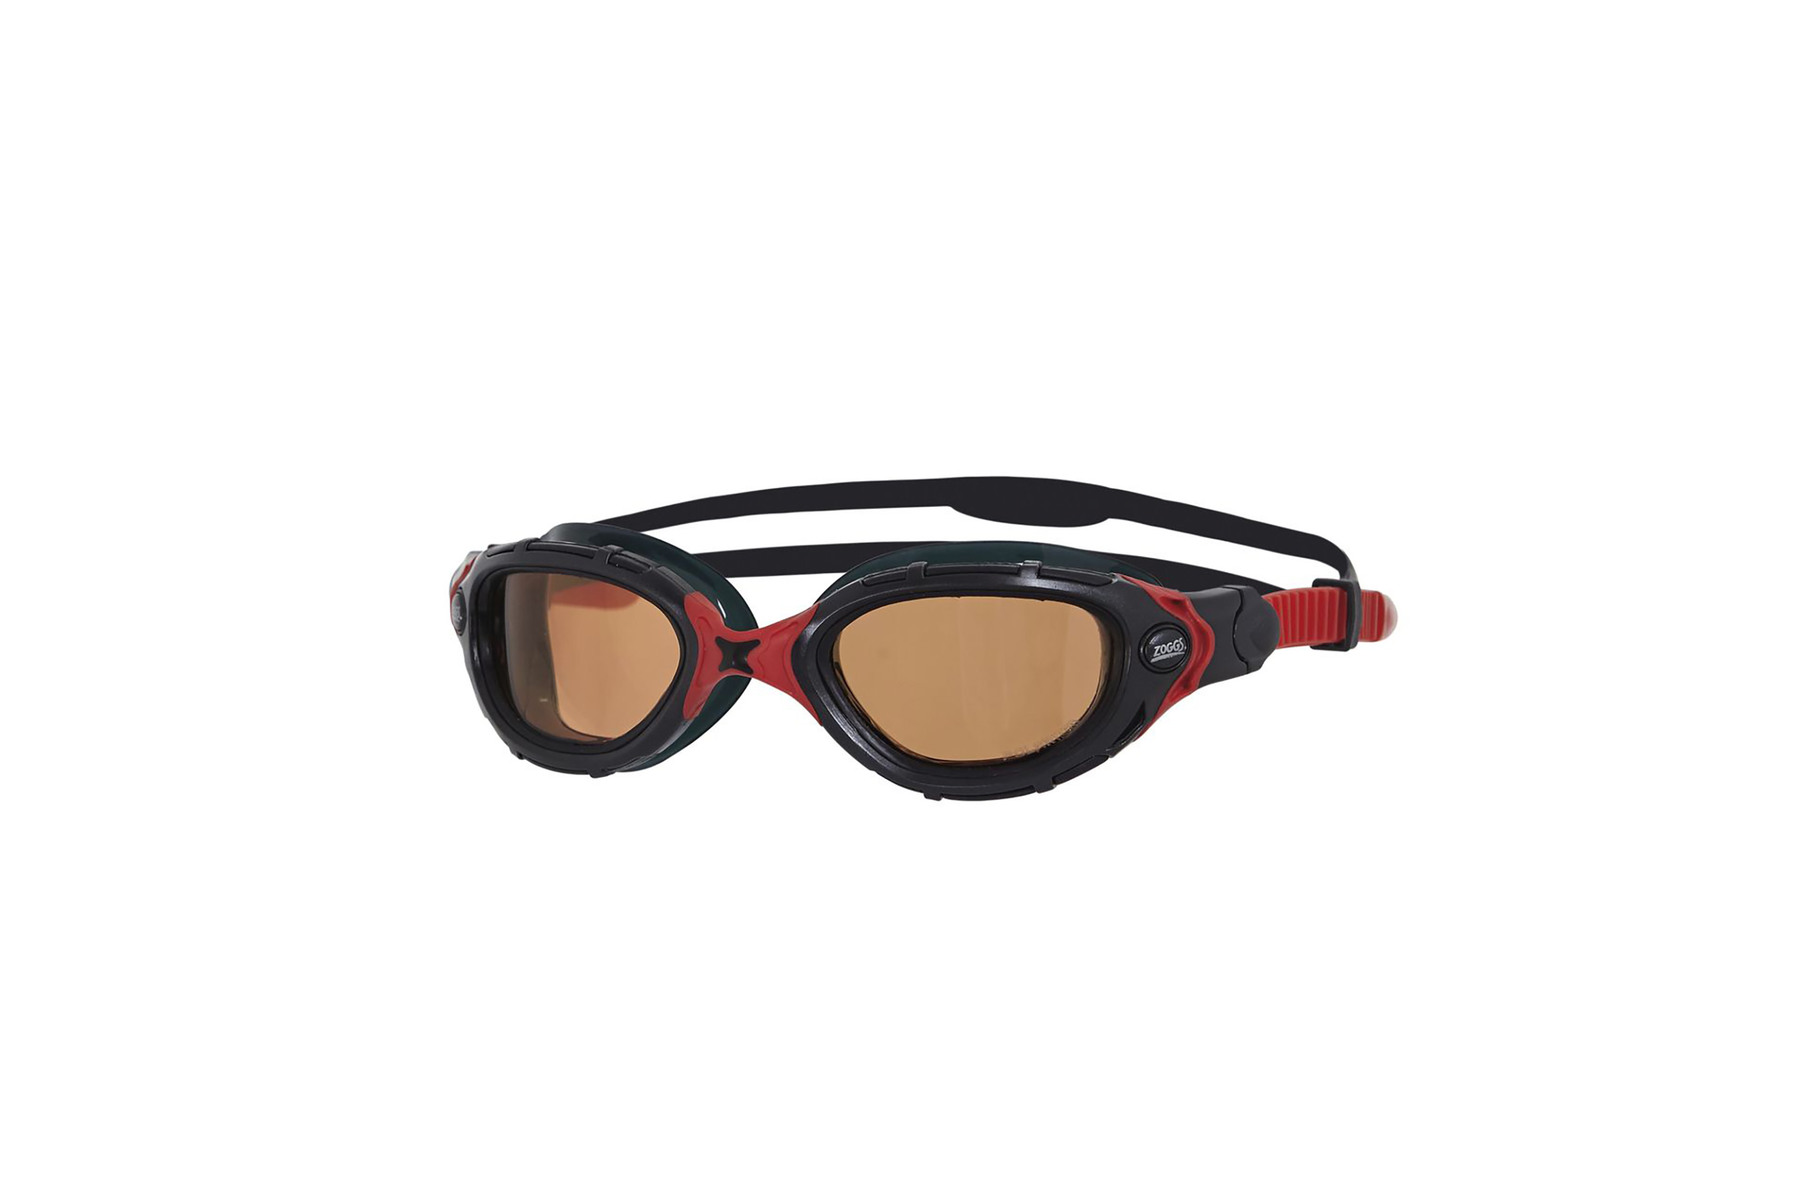 Zoggs Predator Flex - Lunettes de natation - blanc/noir 2018 Lunettes de natation qC1v5E0TK